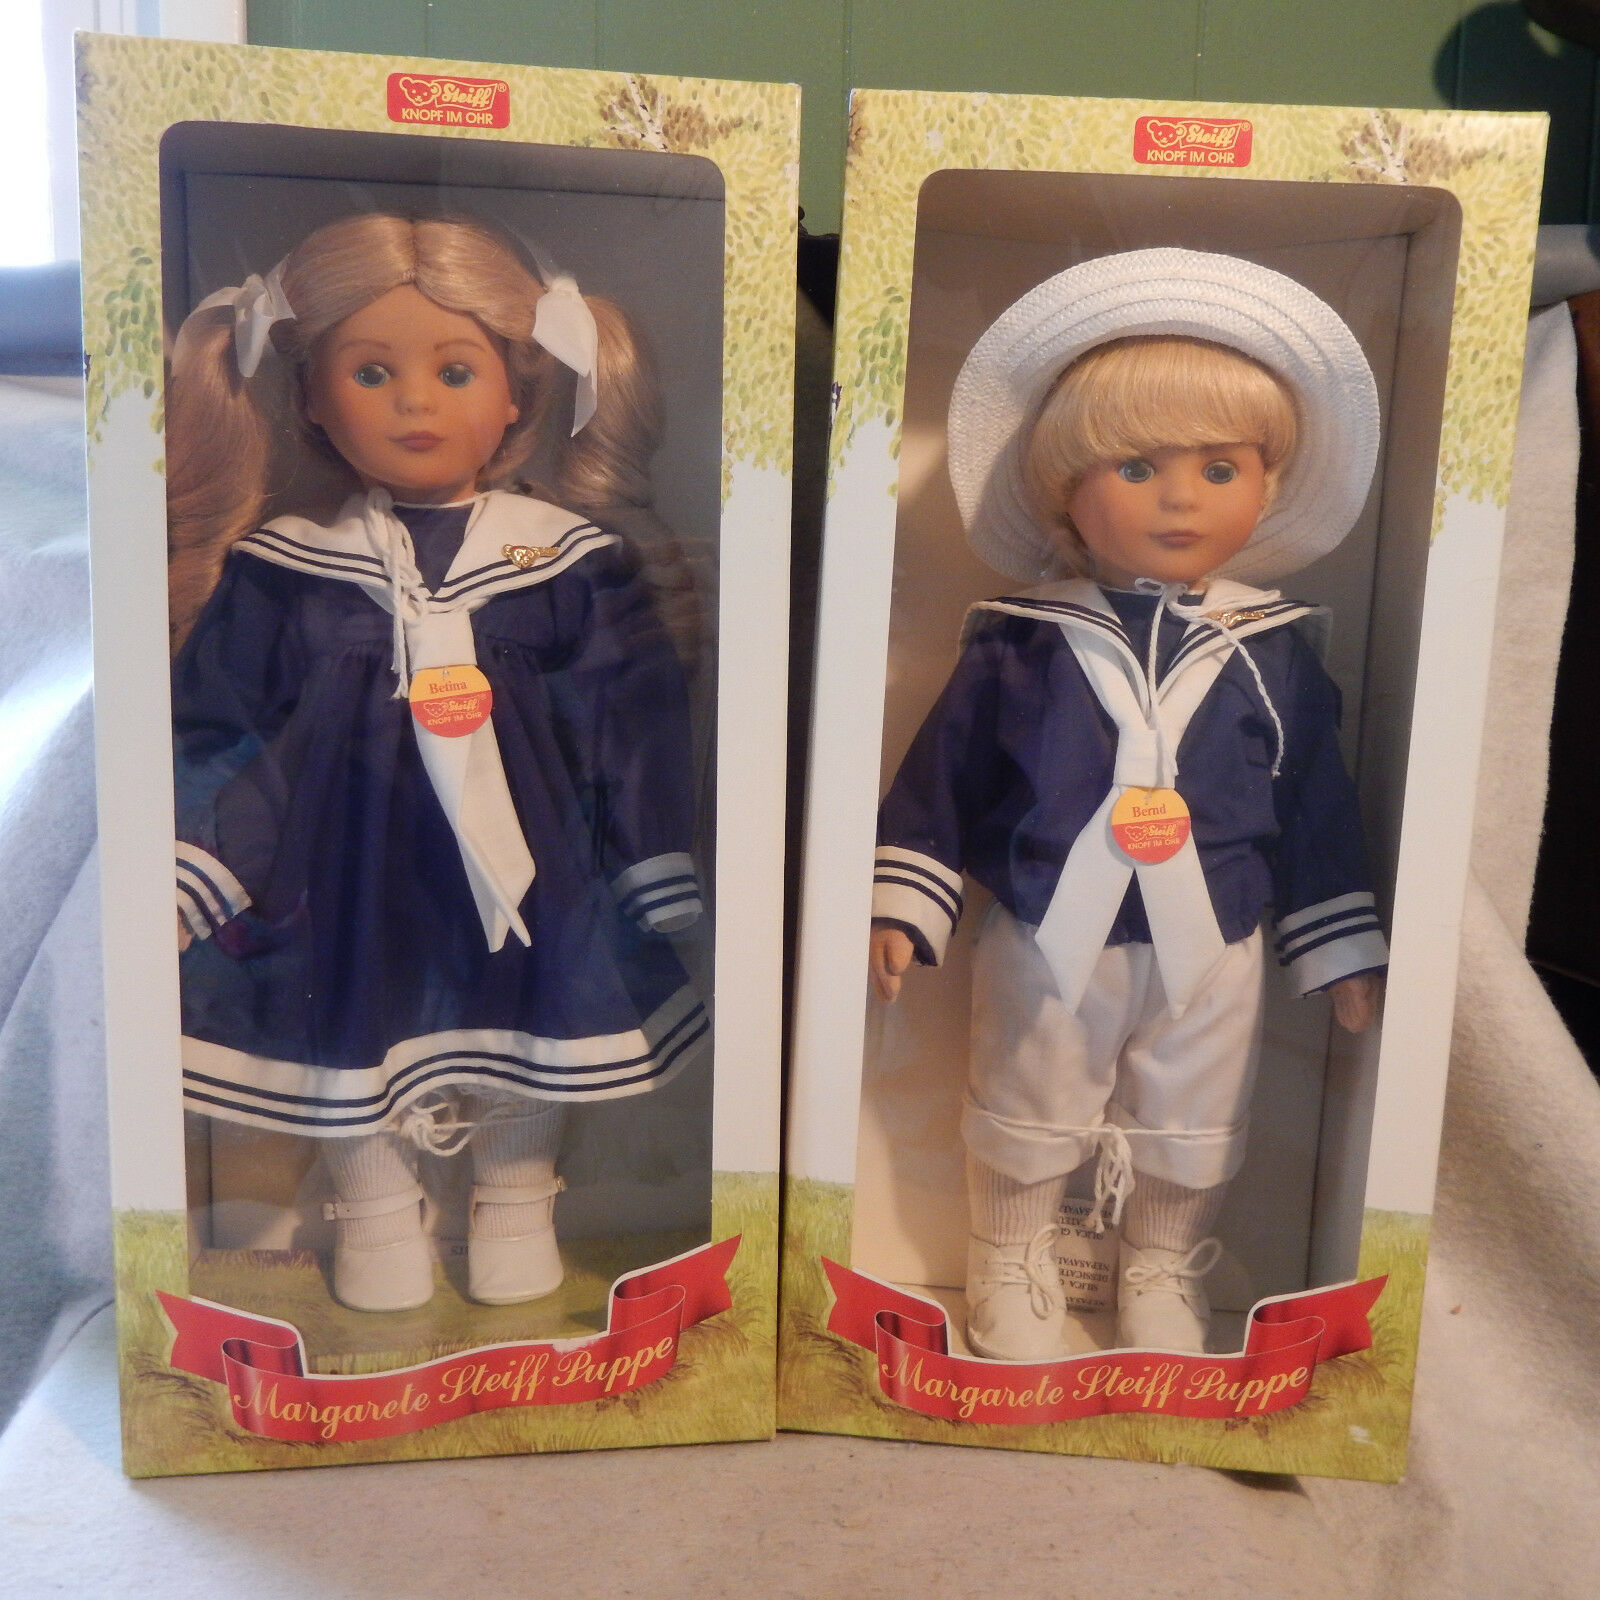 1987 Betina & Bernd Margarete Steiff Puppe Vinyl Doppel Matrosen MIB Paar 16B